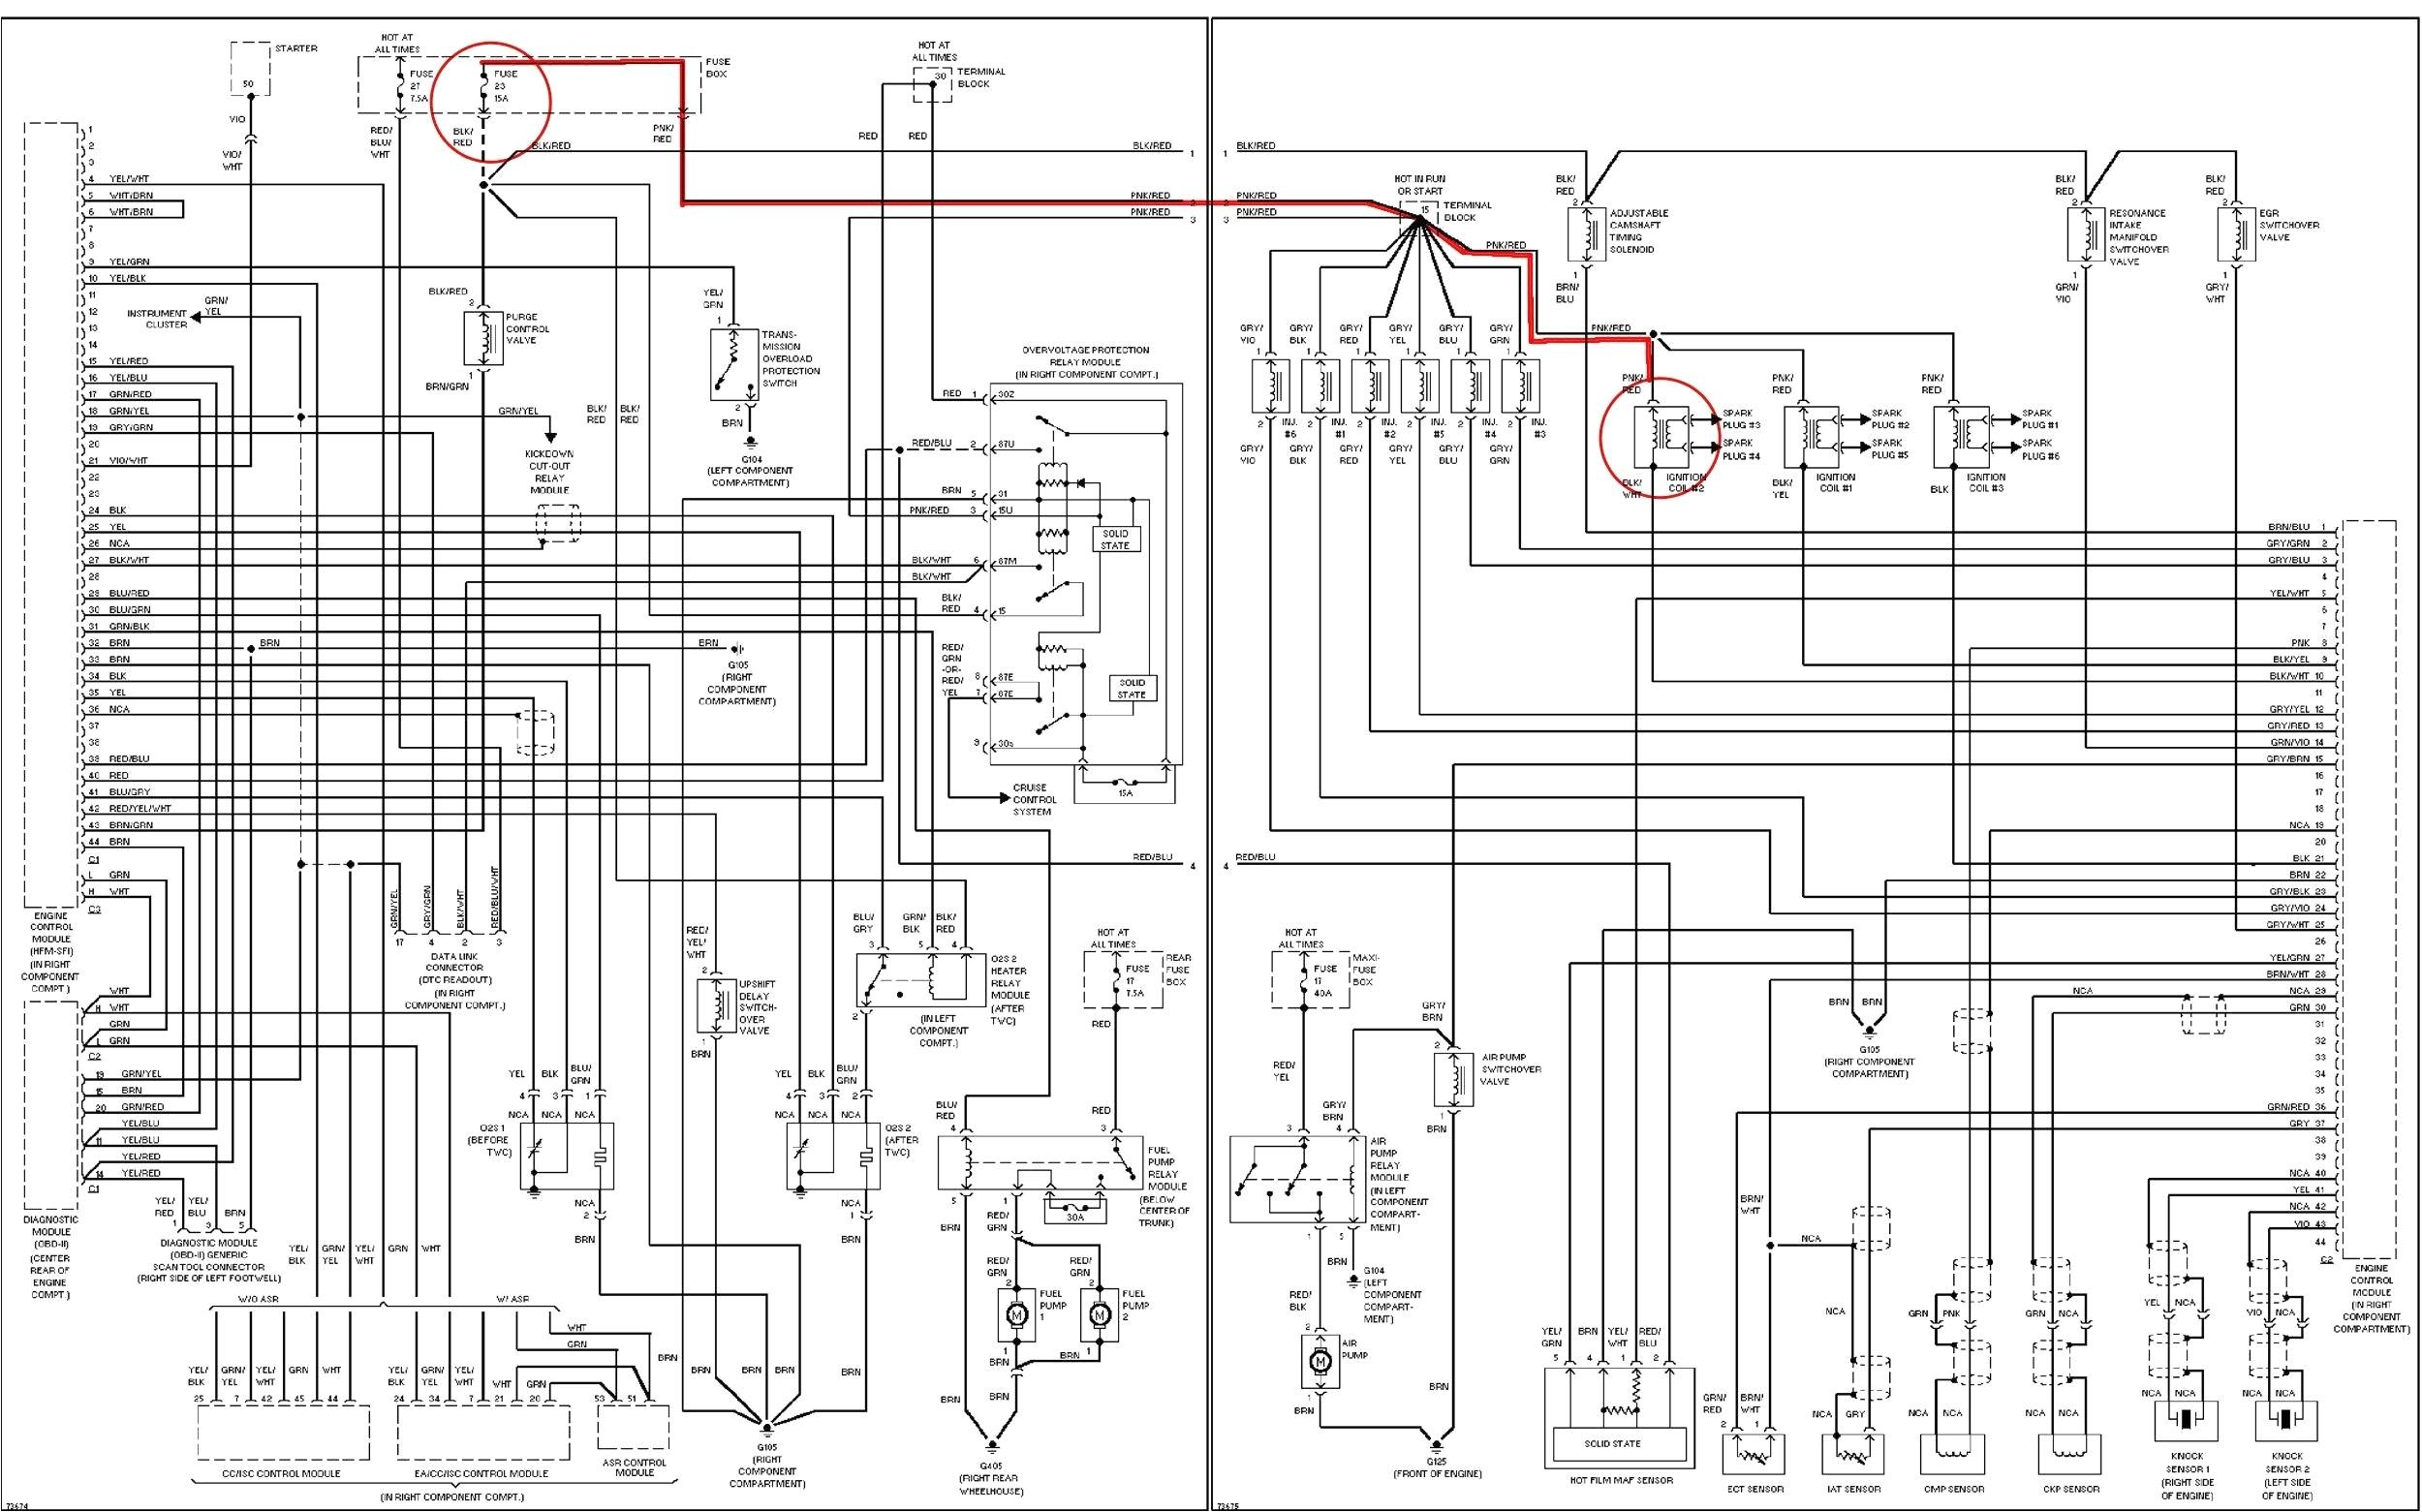 sprinter wiring diagrams library wiring diagram 2008 sprinter wiring diagram door